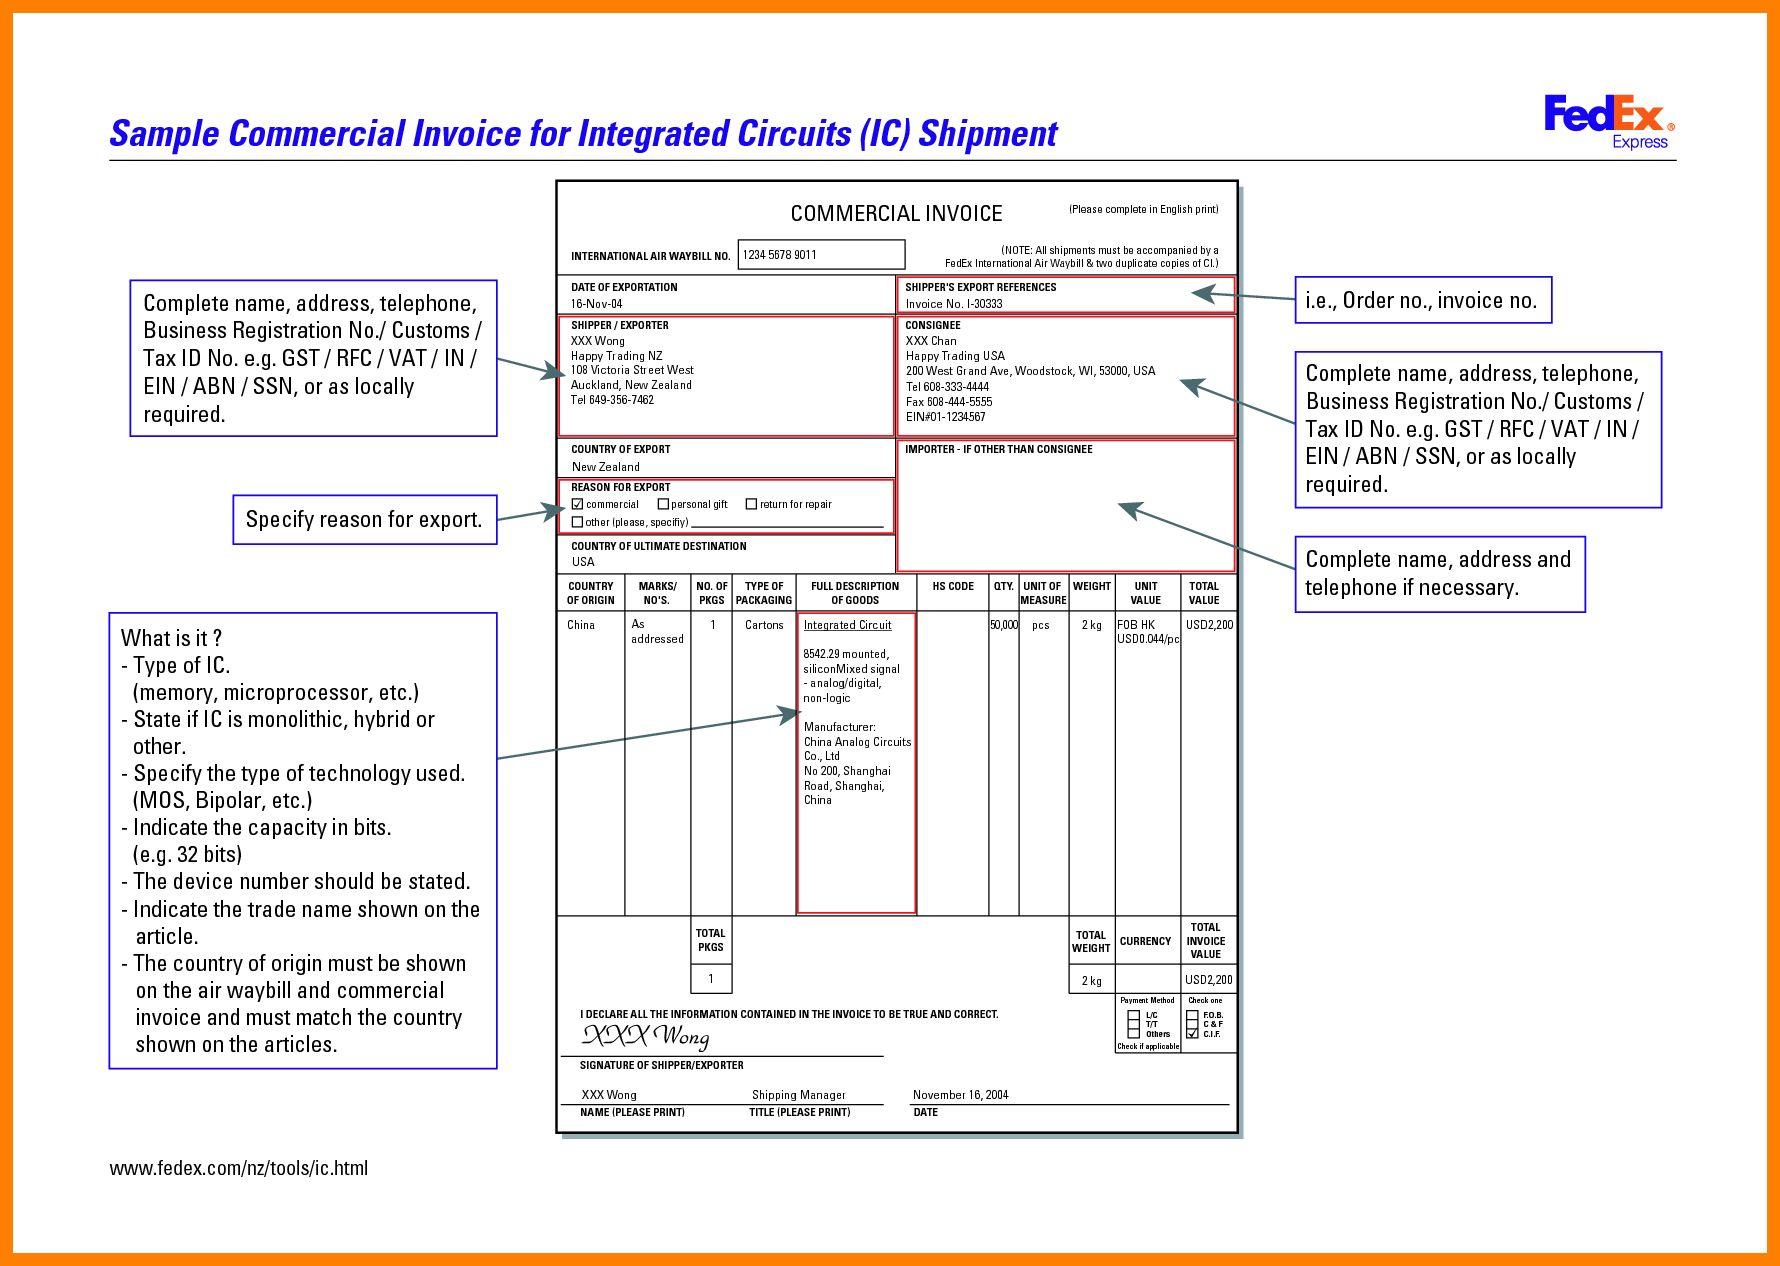 Fedex Commercial Invoice Sample Apcc2017 With Regard To Fedex Proforma Invoice Template Best Professi Invoice Sample Invoice Template Invoice Template Word Fedex proforma invoice template pdf